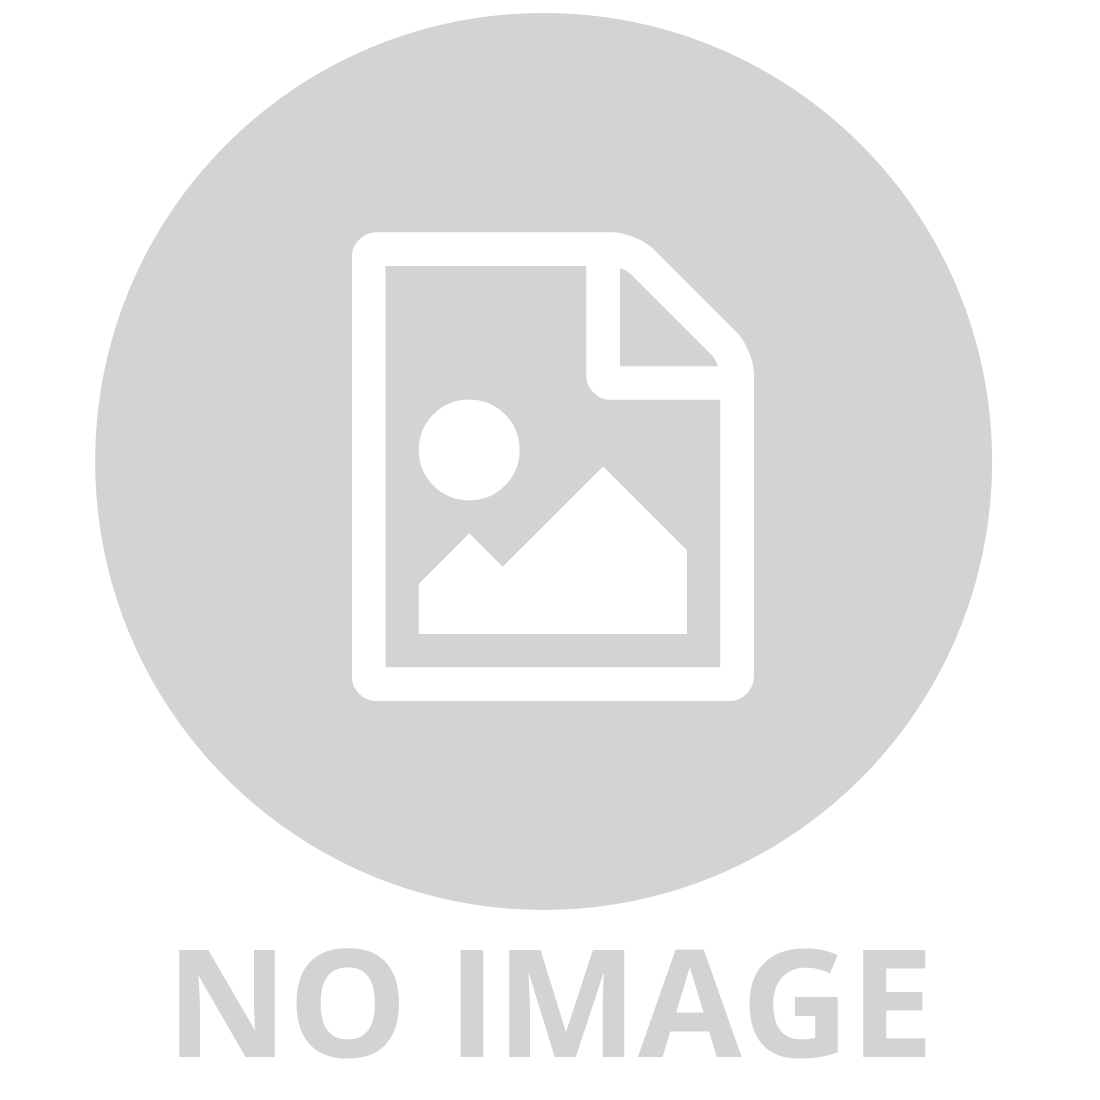 LEGO CITY 60237 CURVE & CROSSROAD